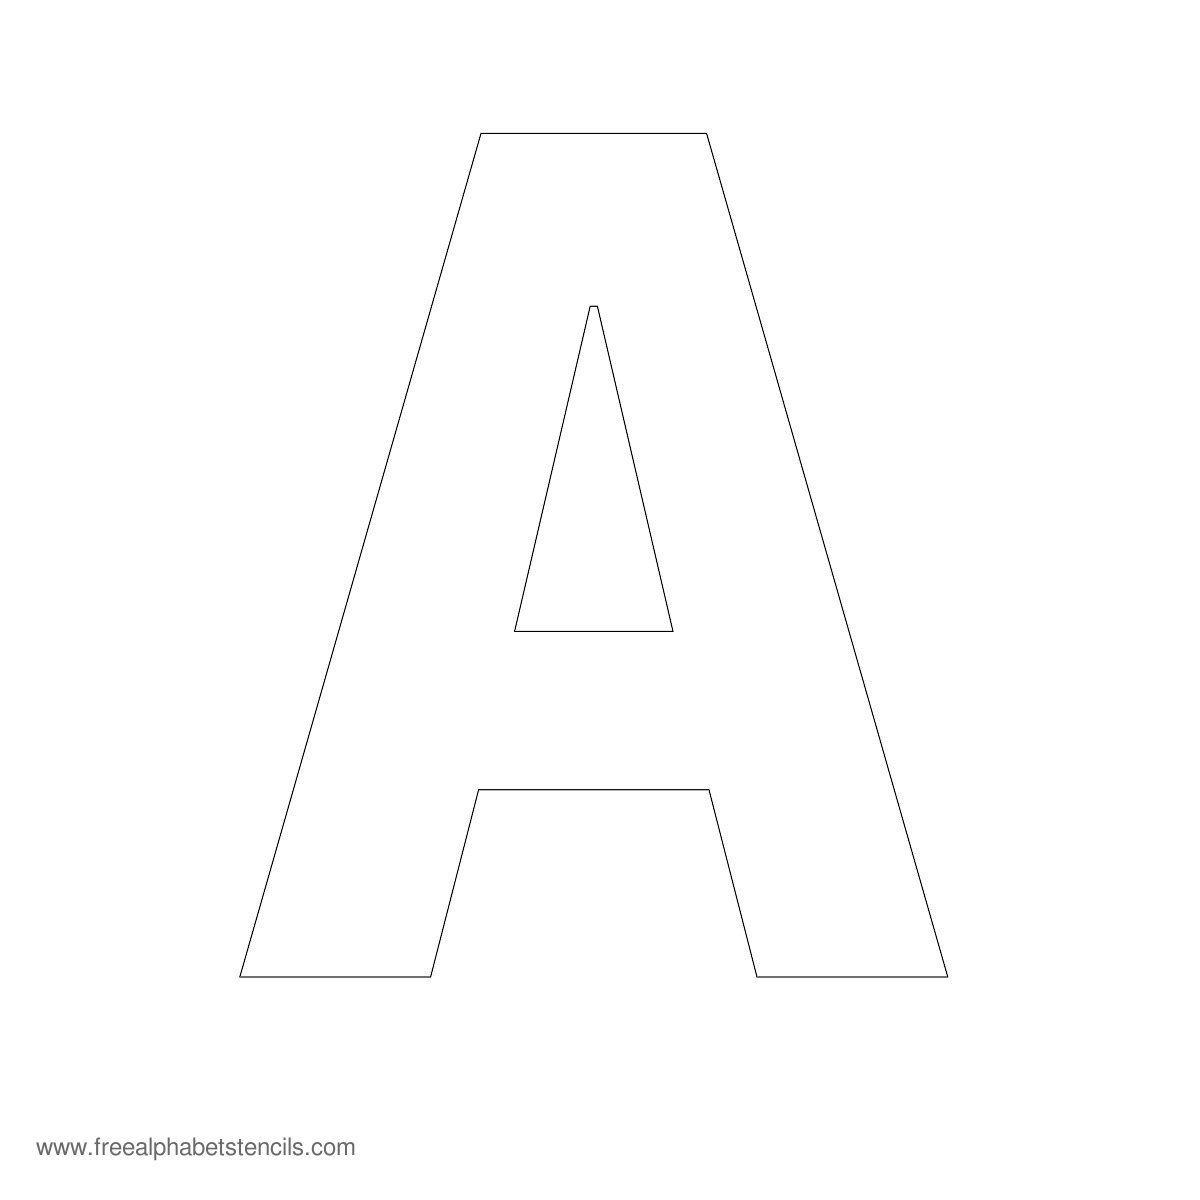 Free Printable Fancy Letters   Free Printable Large Alphabet Letter - Free Printable Letters